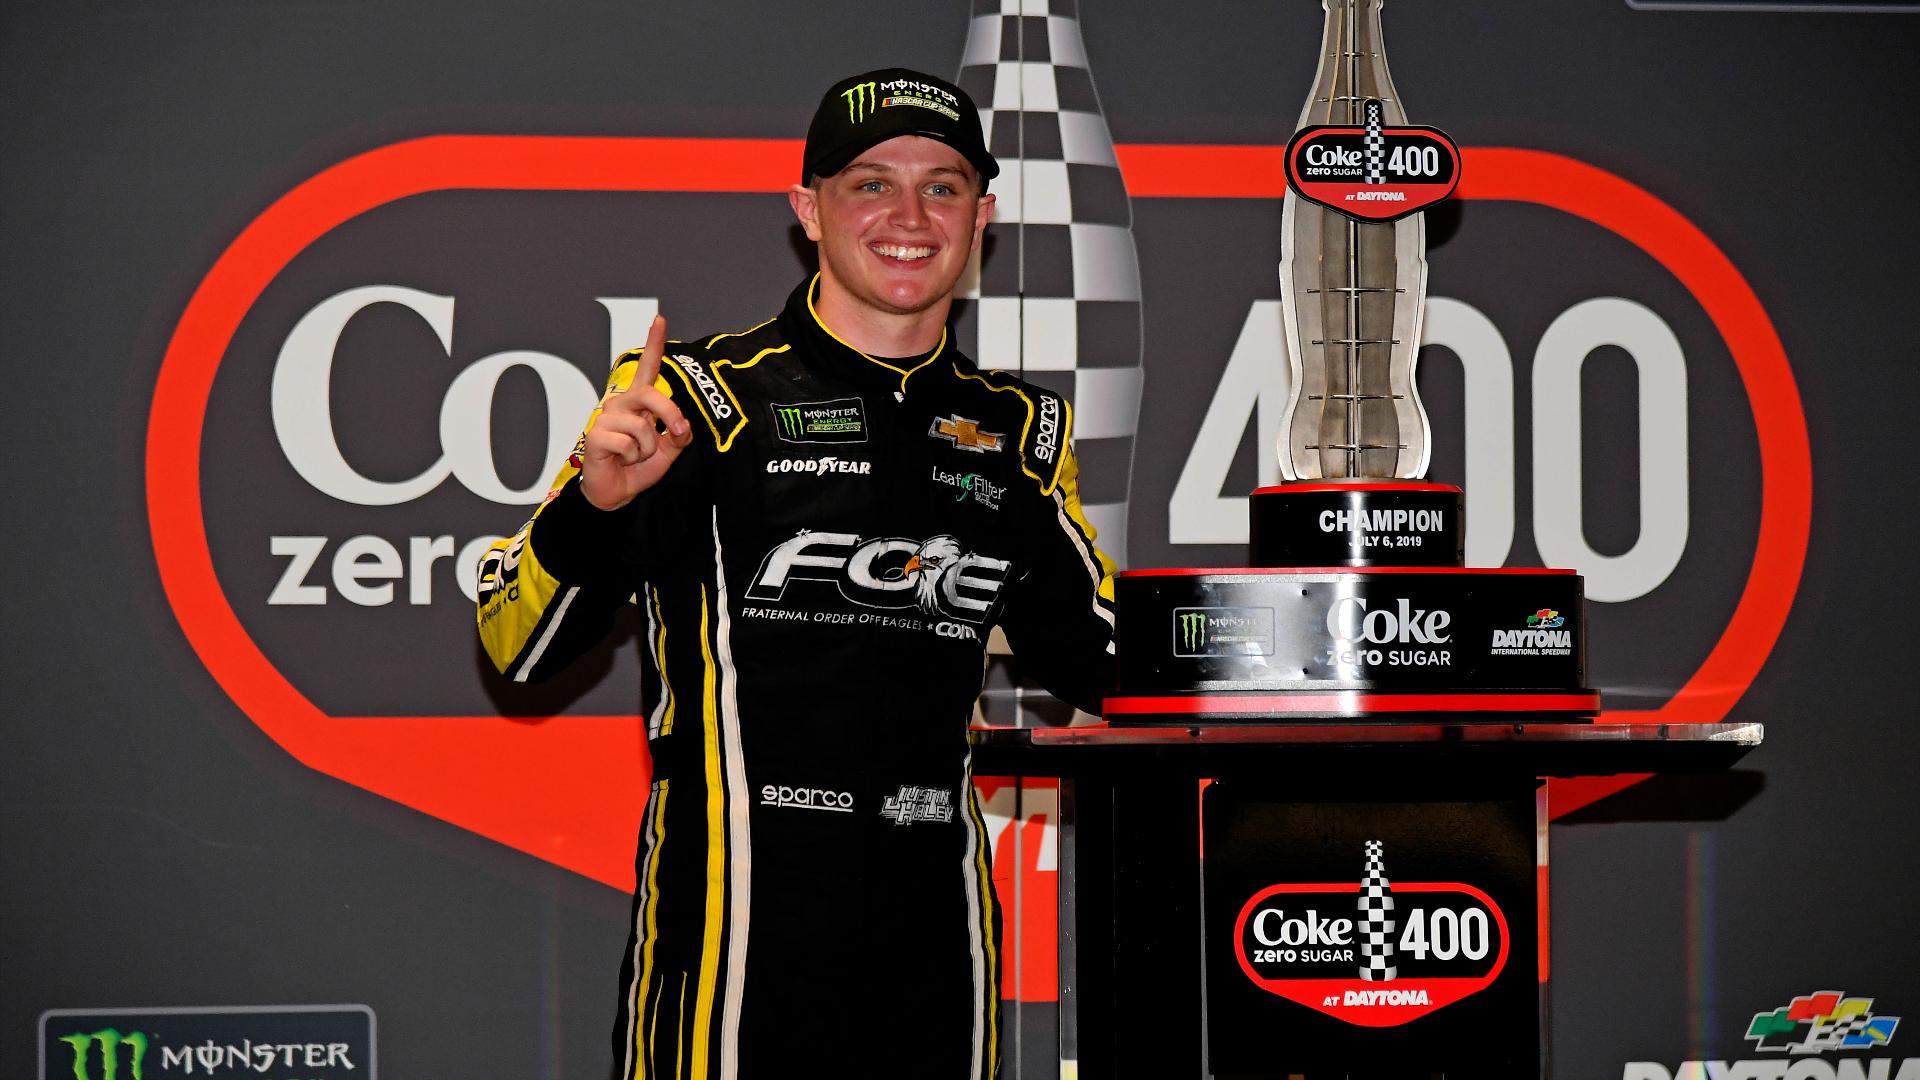 Recapping the week in NASCAR: Justin Haley wins rain-shortened and postponed race at Daytona – NBCSports.com